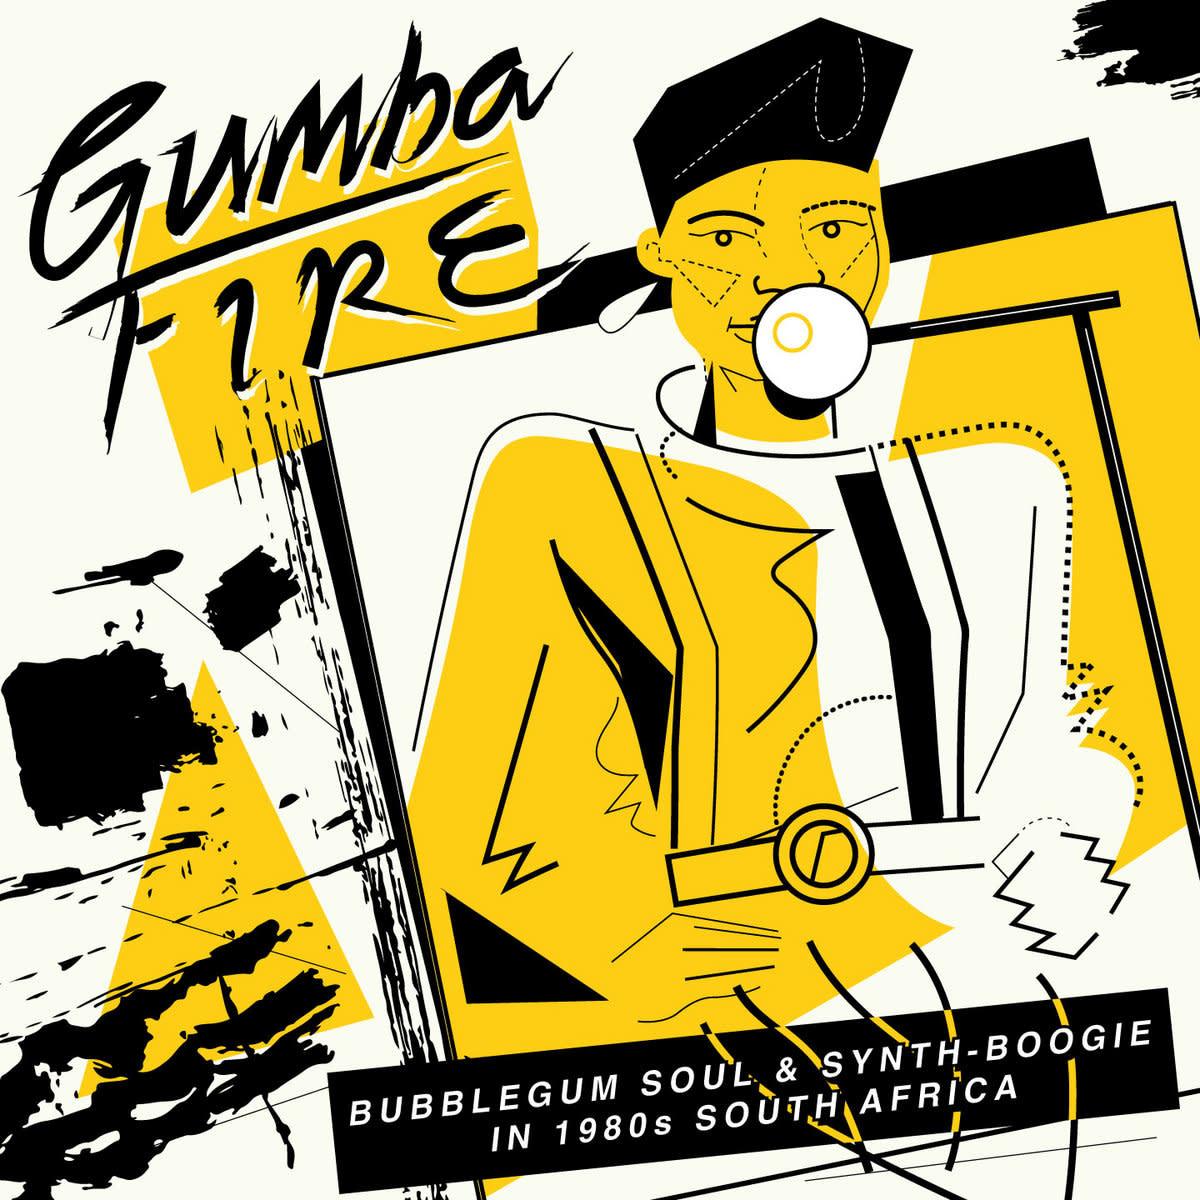 Artistes Variés • Gumba Fire (Bubblegum Soul & Synth-Boogie In 1980s South Africa, 3LP)-1